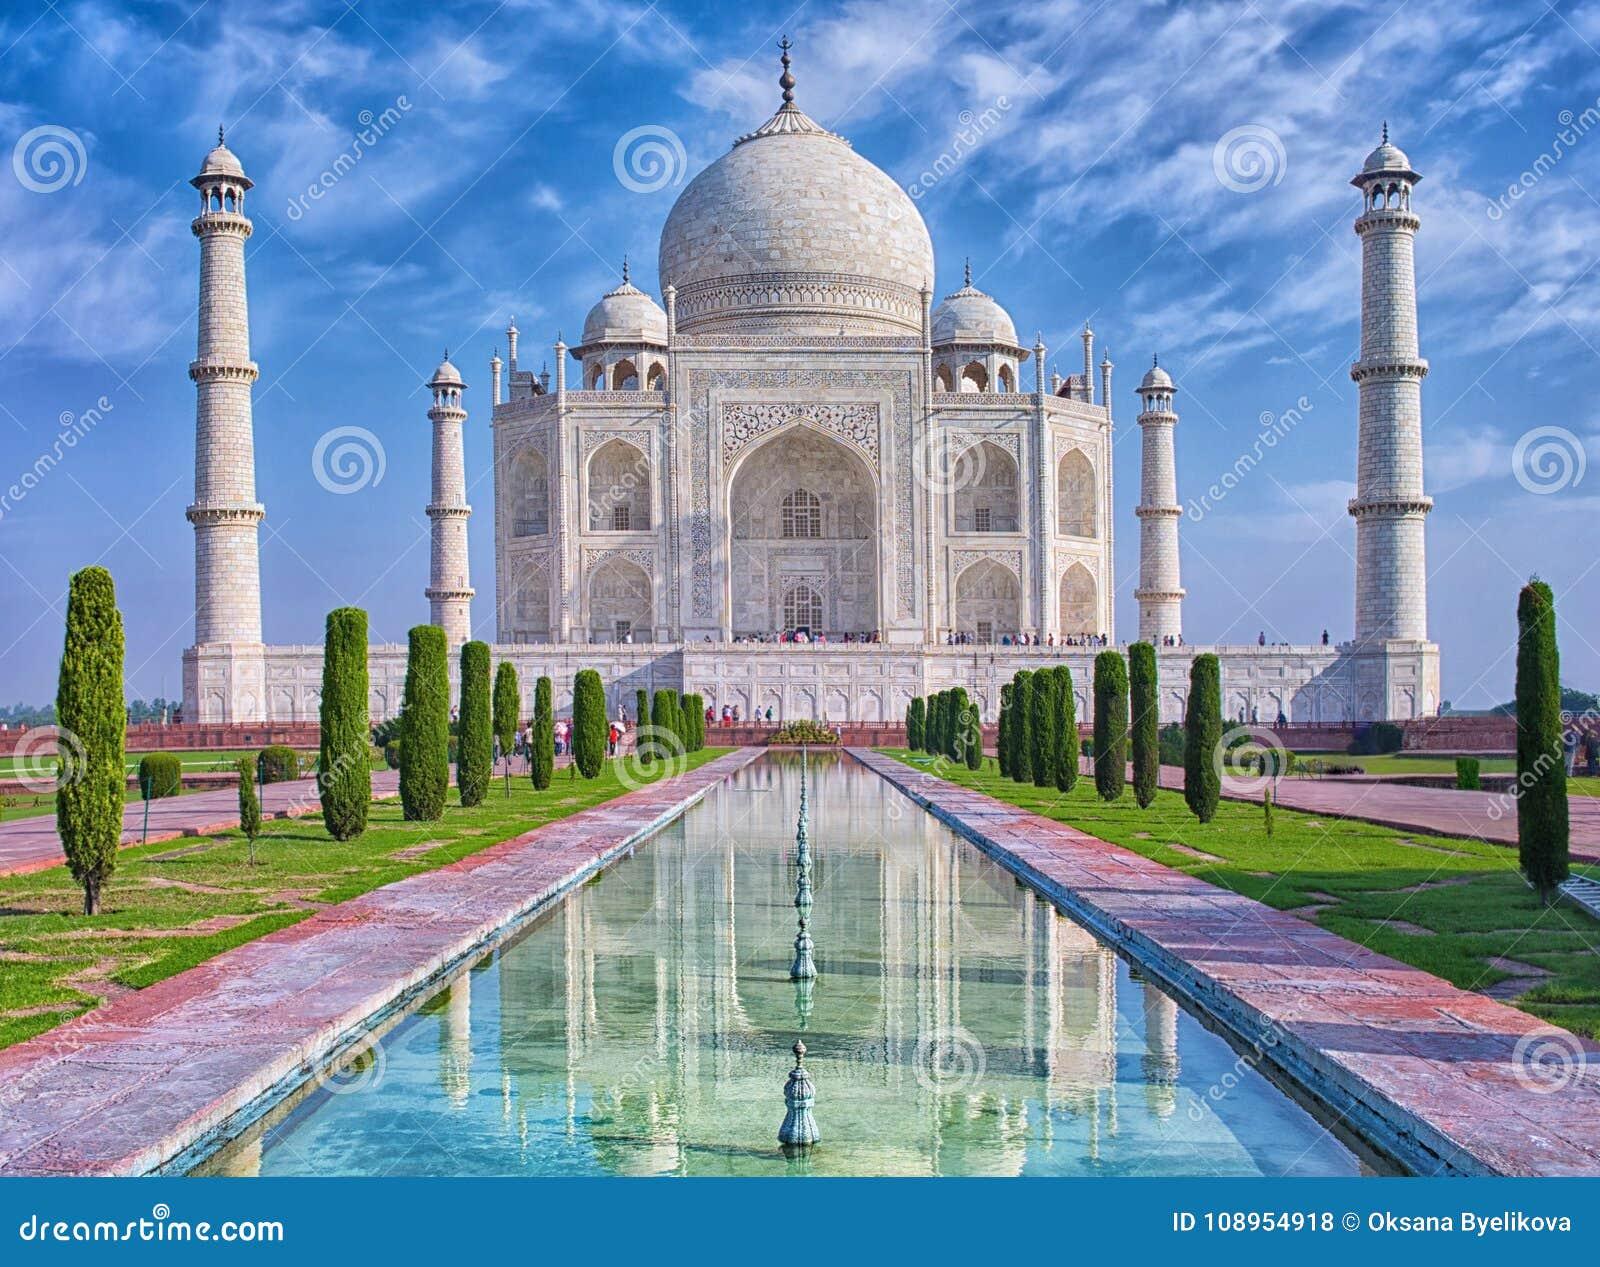 Download Taj Mahal in Agra, India stock photo. Image of religion - 108954918